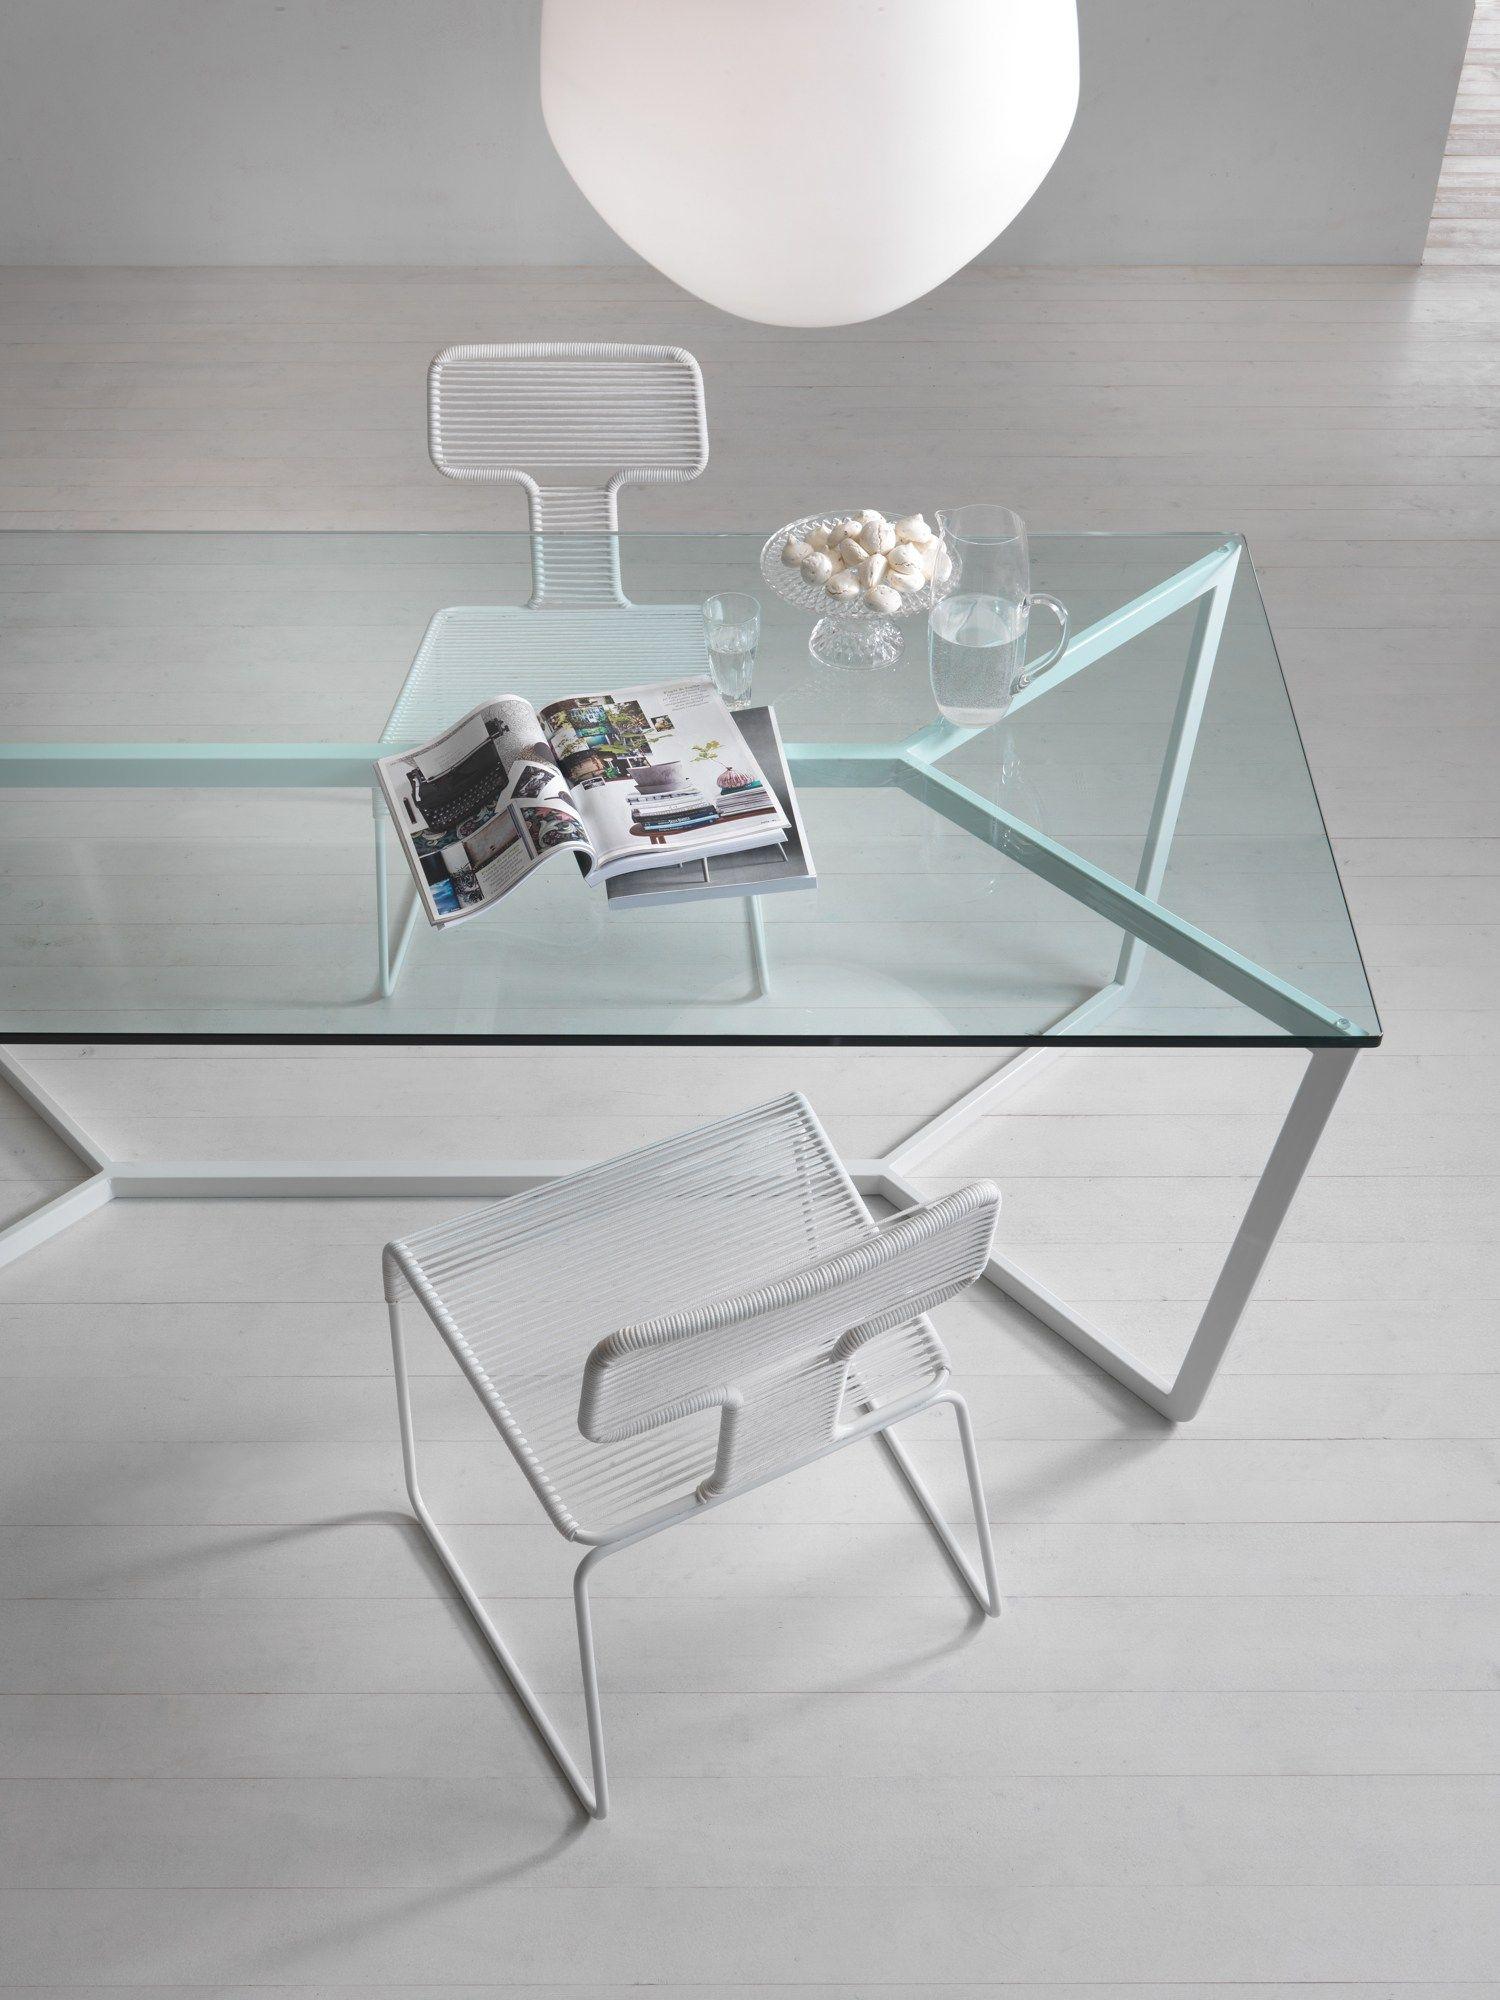 Mesa de comedor rectangular barata de cristal templado for Cristal para mesa rectangular